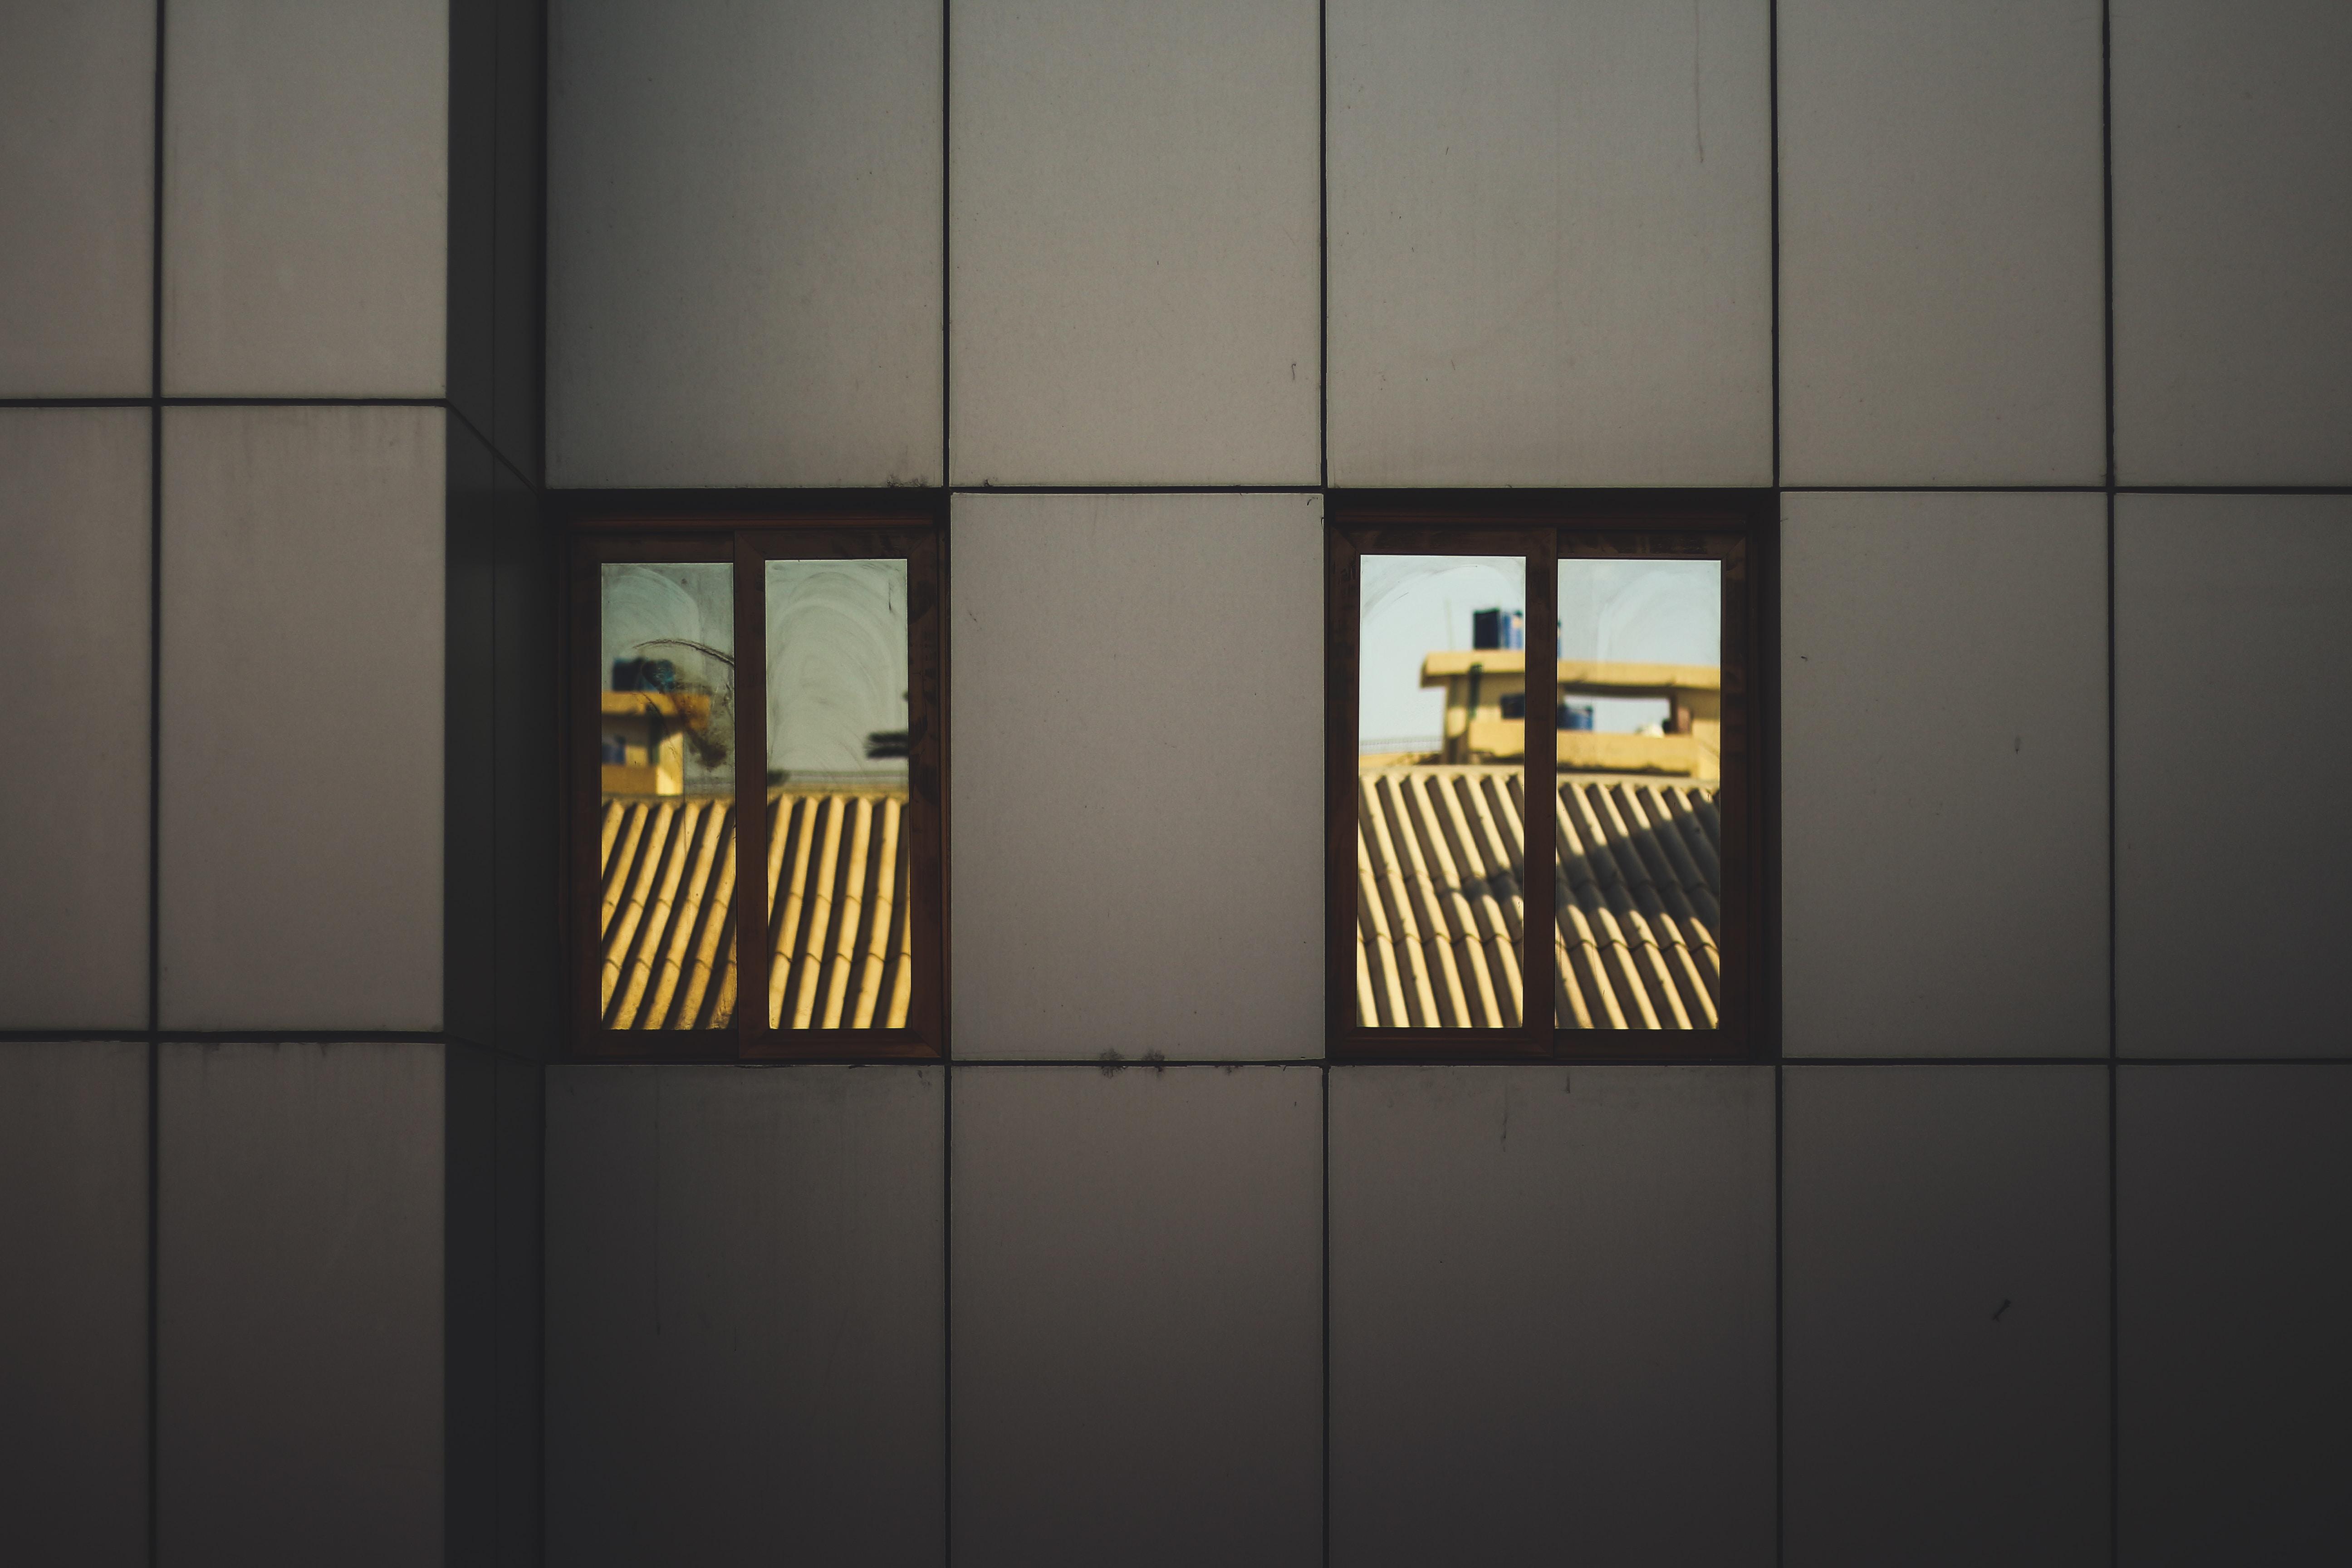 Two small windows in a tiled facade